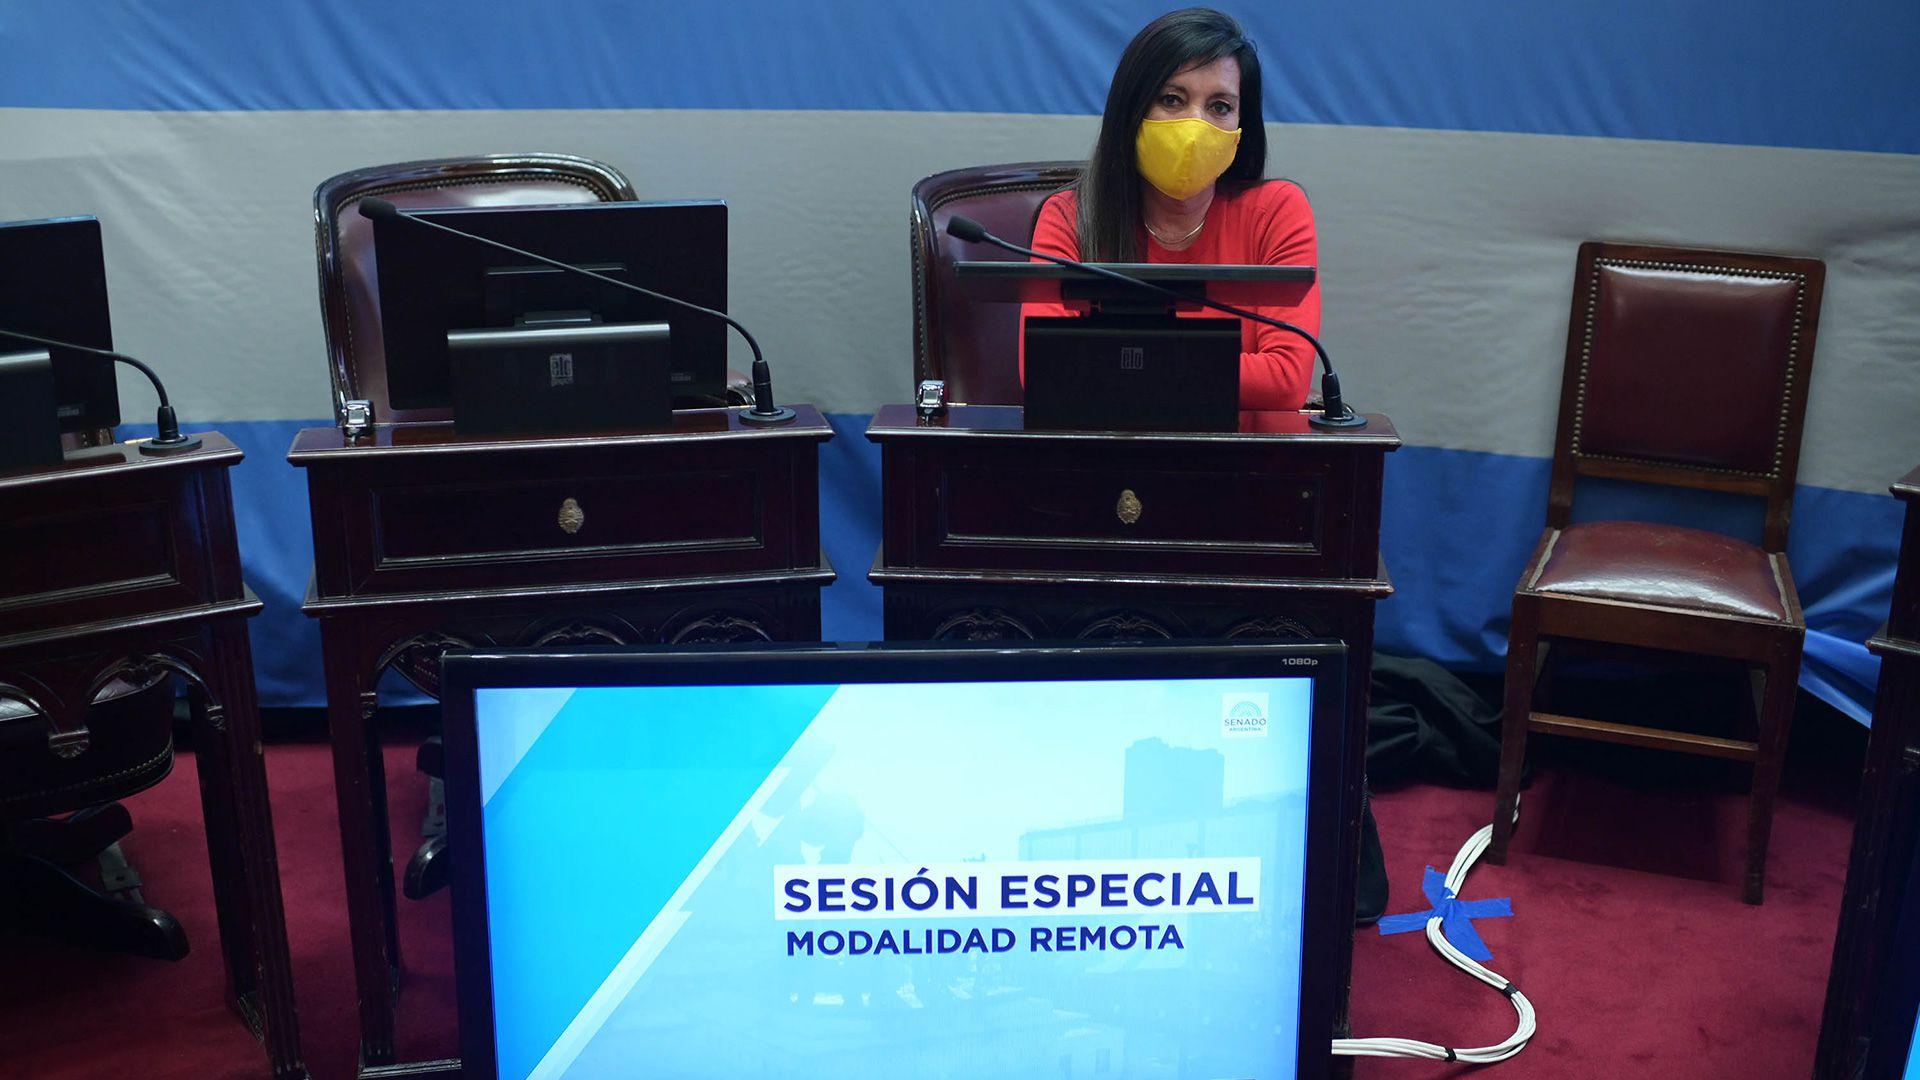 senado ley del Poder Ejecutivo sesion remota 24 6